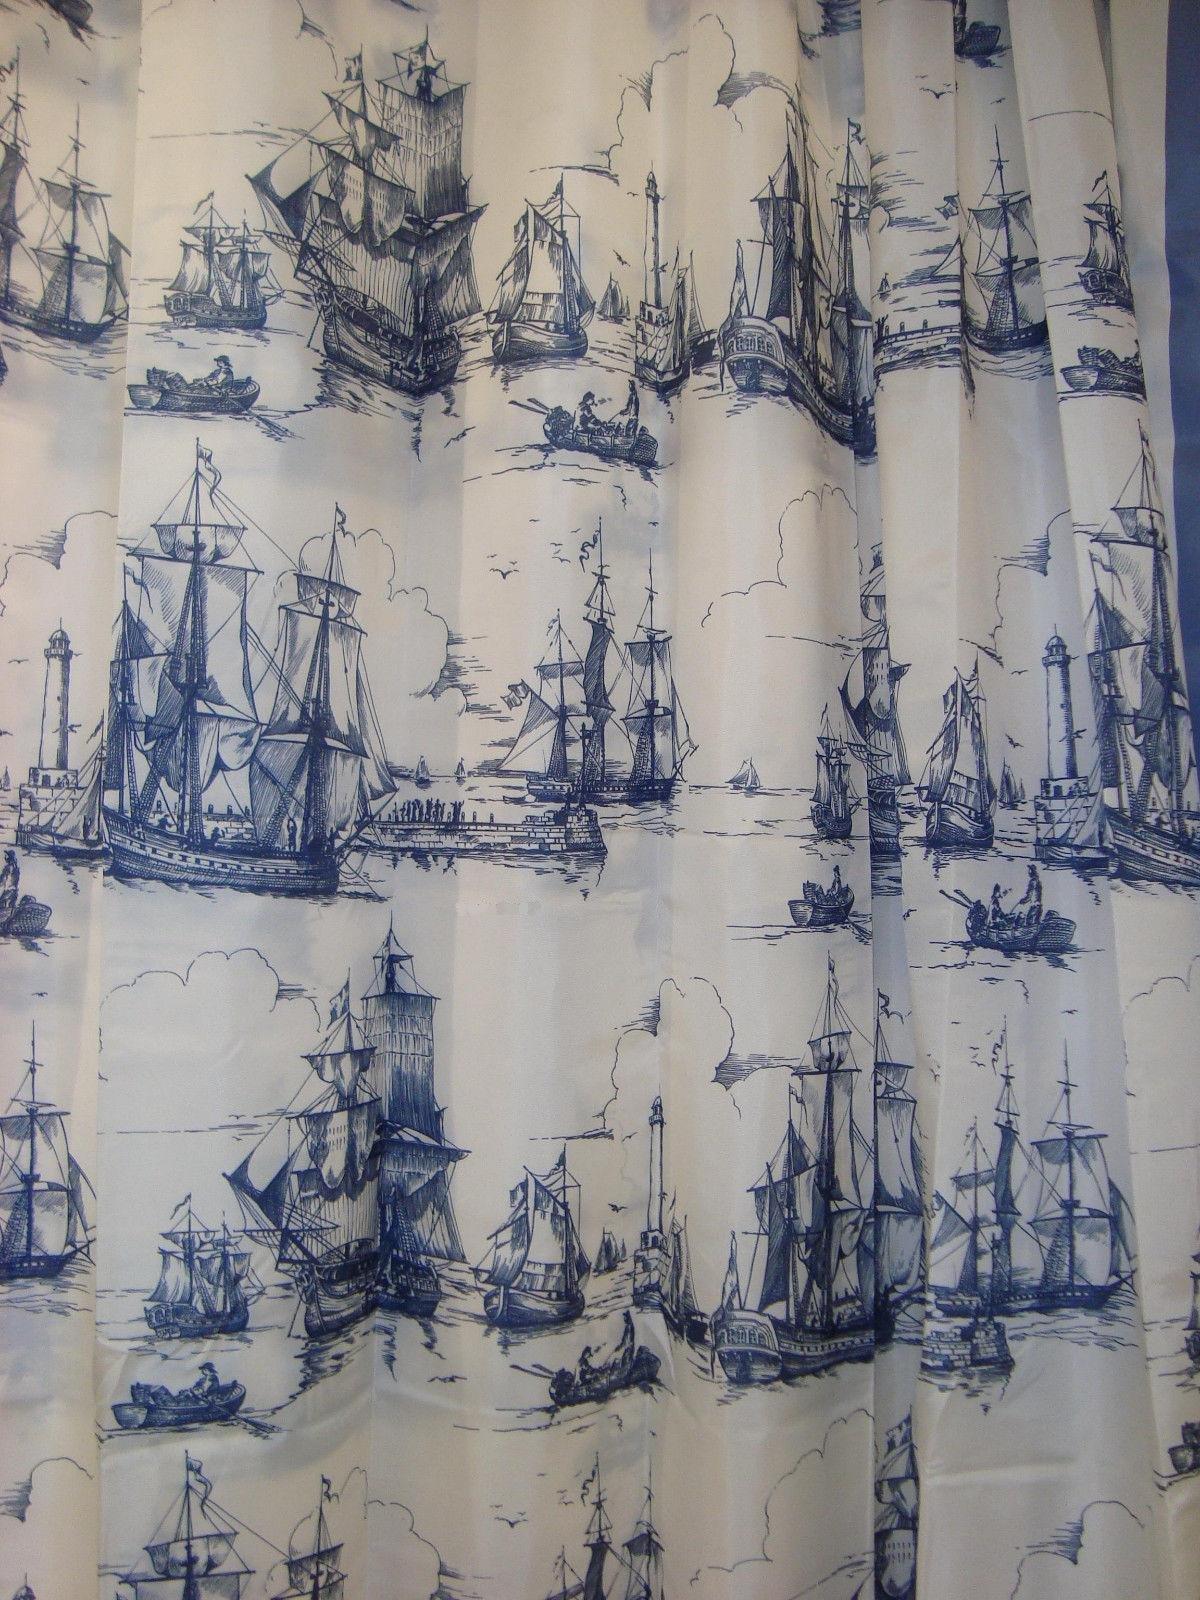 "Ikea Nautical Tall Ship Boat Lighthouse Navy White Fabric Shower Curtain 71 X 71 Aggersund - Ikea Nautical Tall Ships Boat Lighthouse Navy White Fabric Shower Curtain 71 X 71 Aggersund 71"" x 71"" blue and white - shower-curtains, bathroom-linens, bathroom - 81klo 19VCL -"